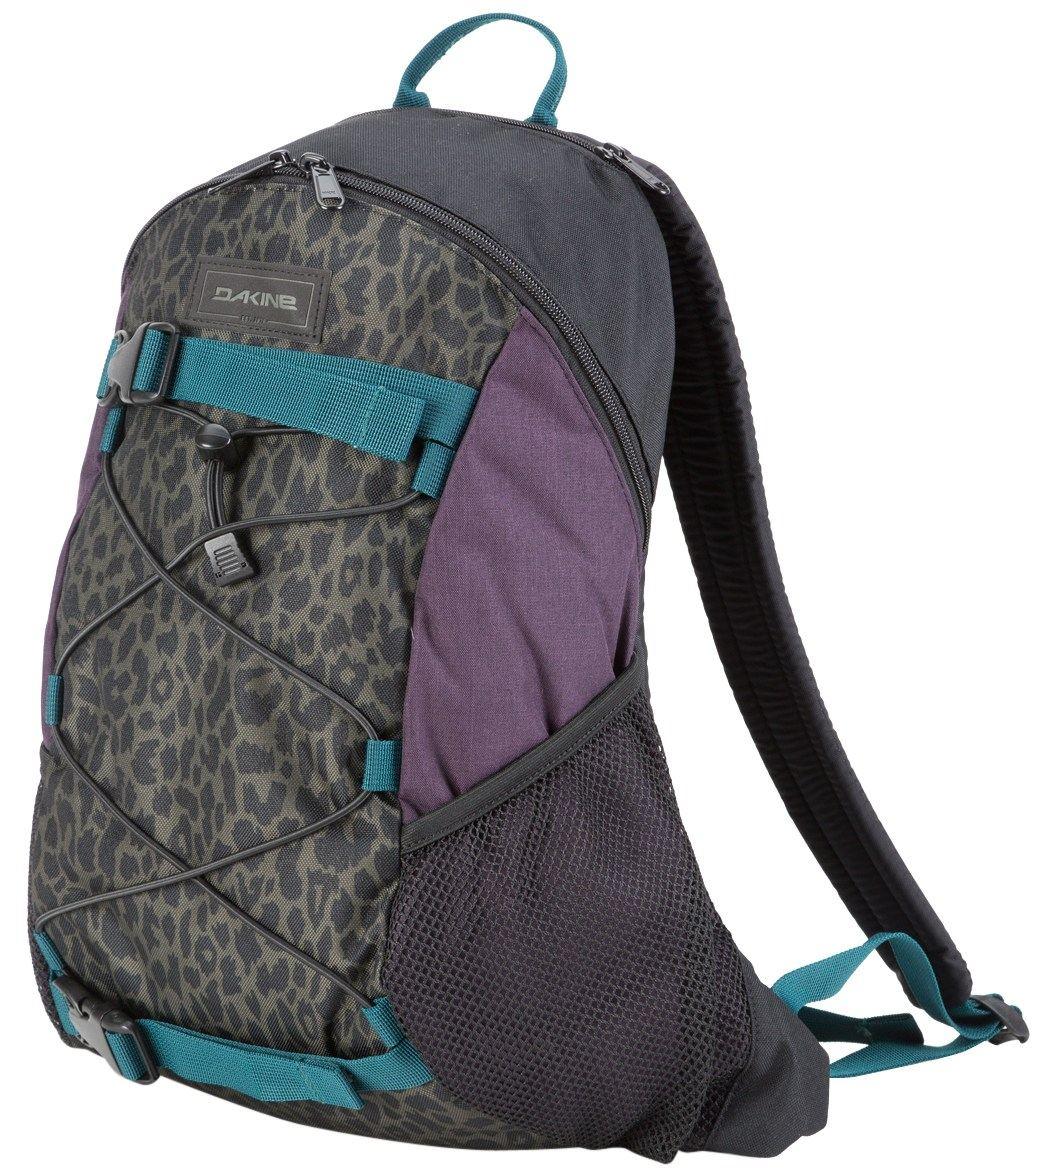 Dakine Women's Wonder 15L Backpack at SwimOutlet.com